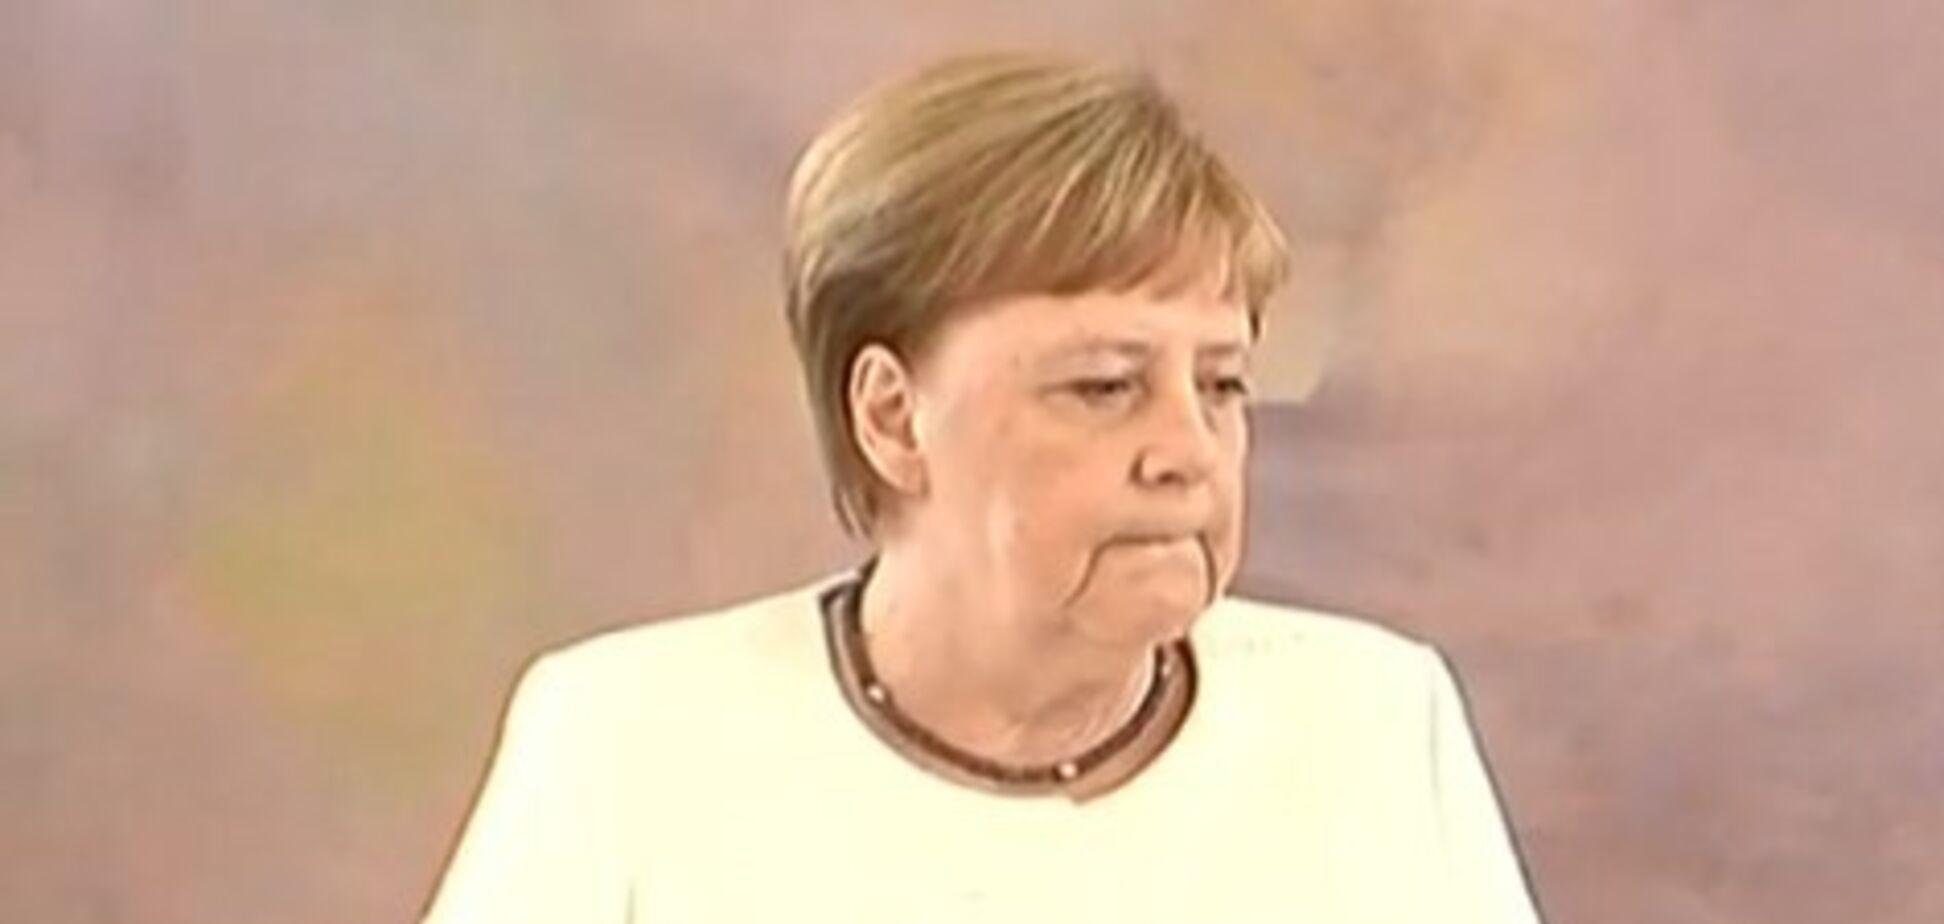 Меркель снова стало плохо на публике: момент попал на видео